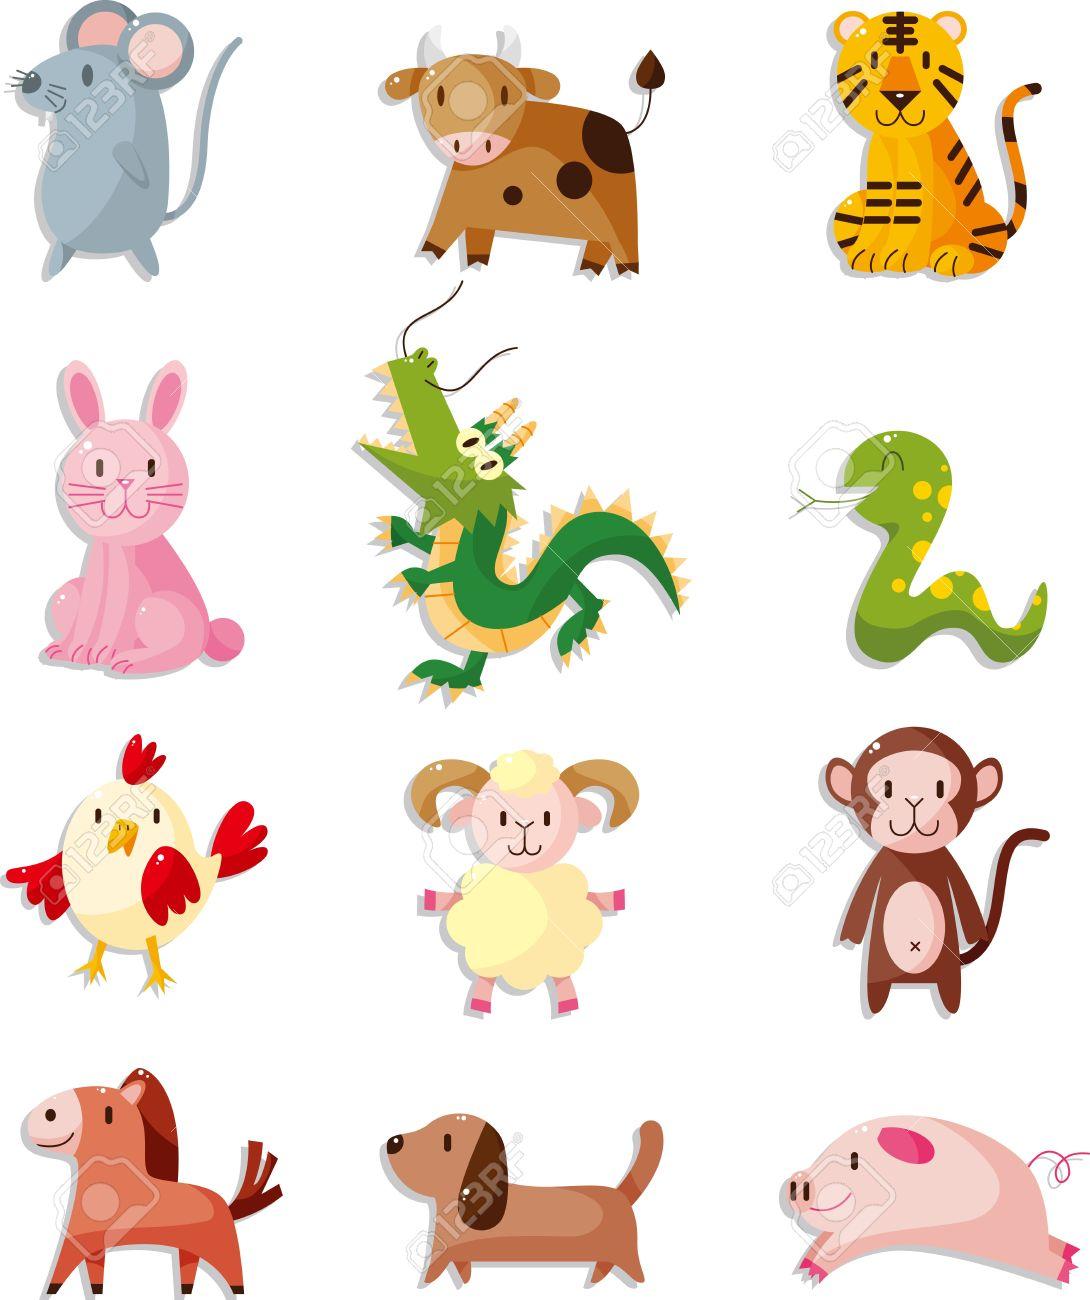 12 animal icon set,Chinese Zodiac animal Stock Vector - 18875988